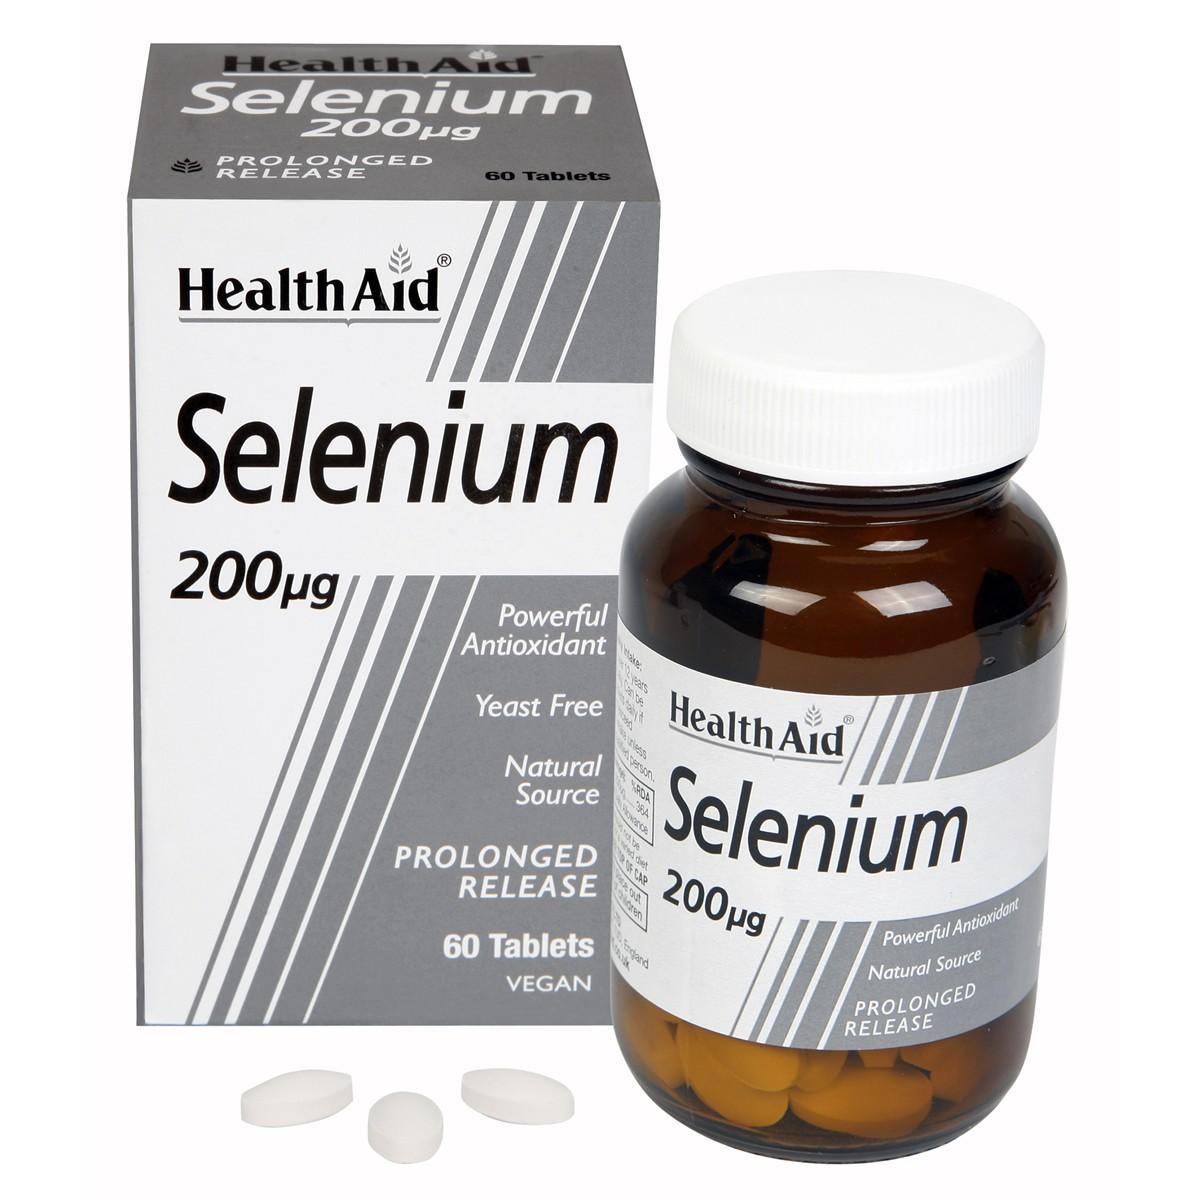 HealthAid Selenium 200ug - Prolonged Release